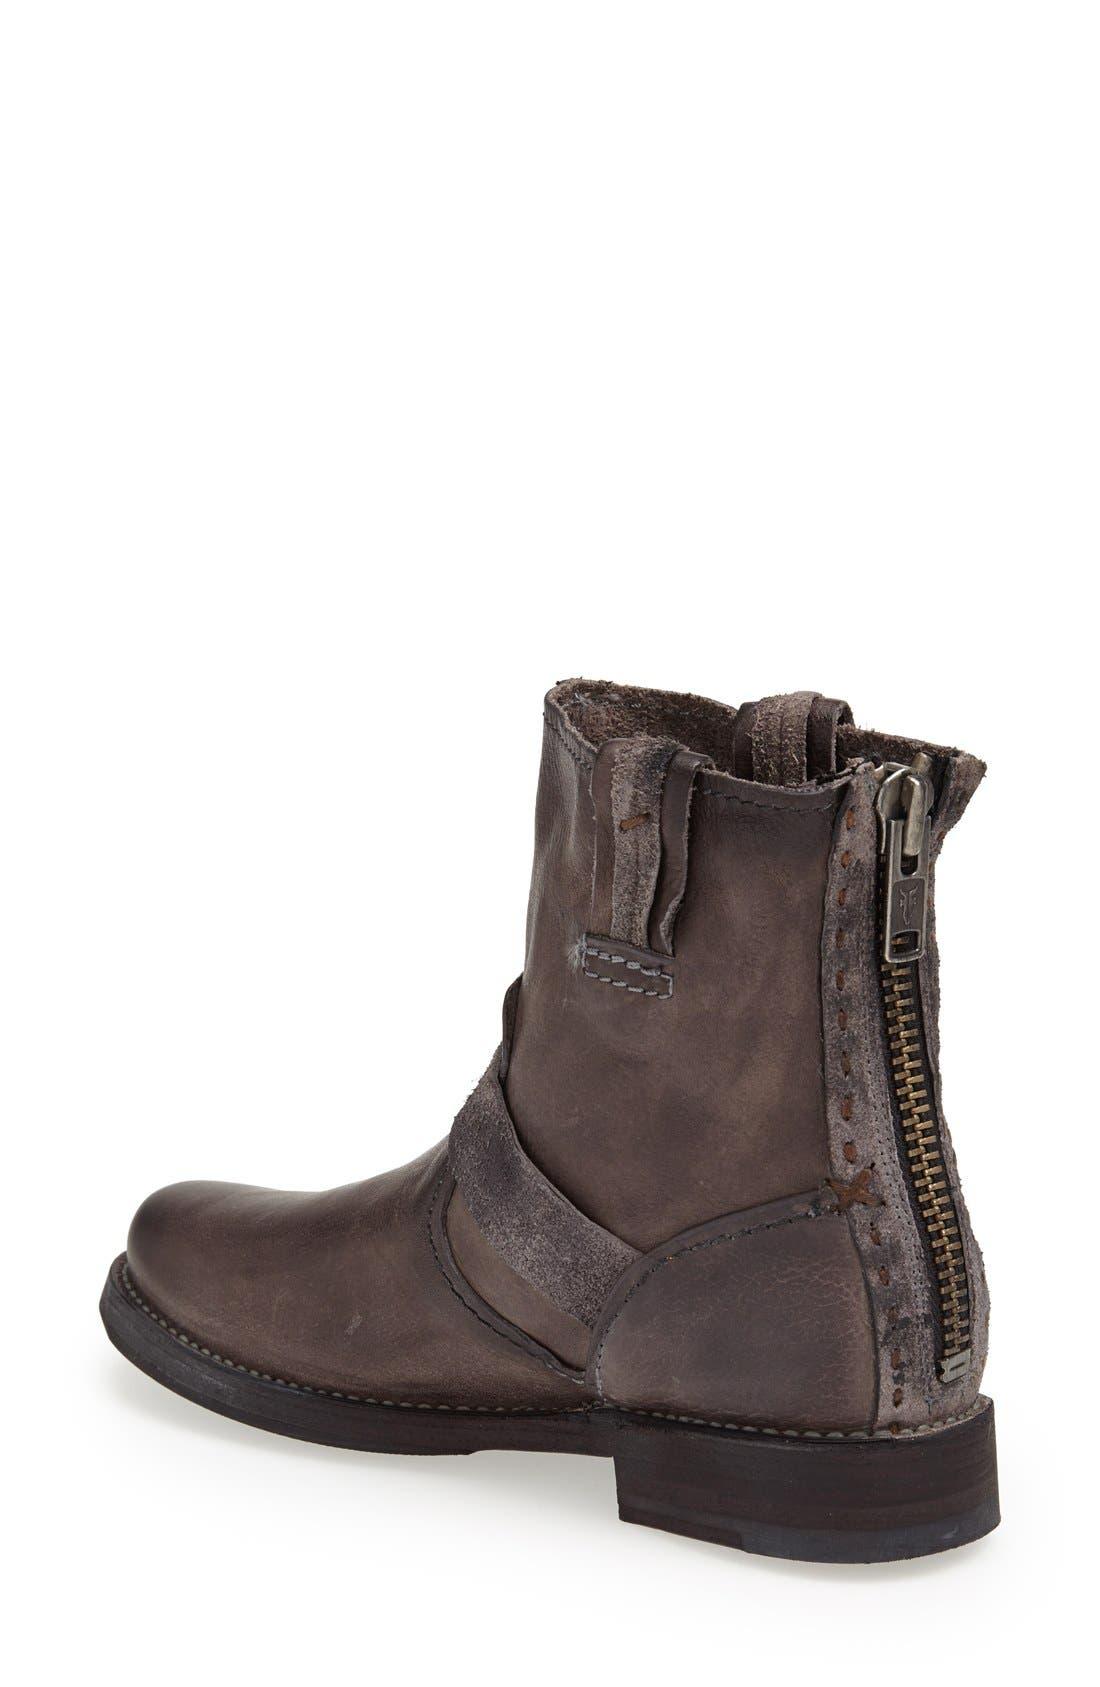 Alternate Image 3  - Frye 'Vicky Artisan' Back Zip Boot (Women)